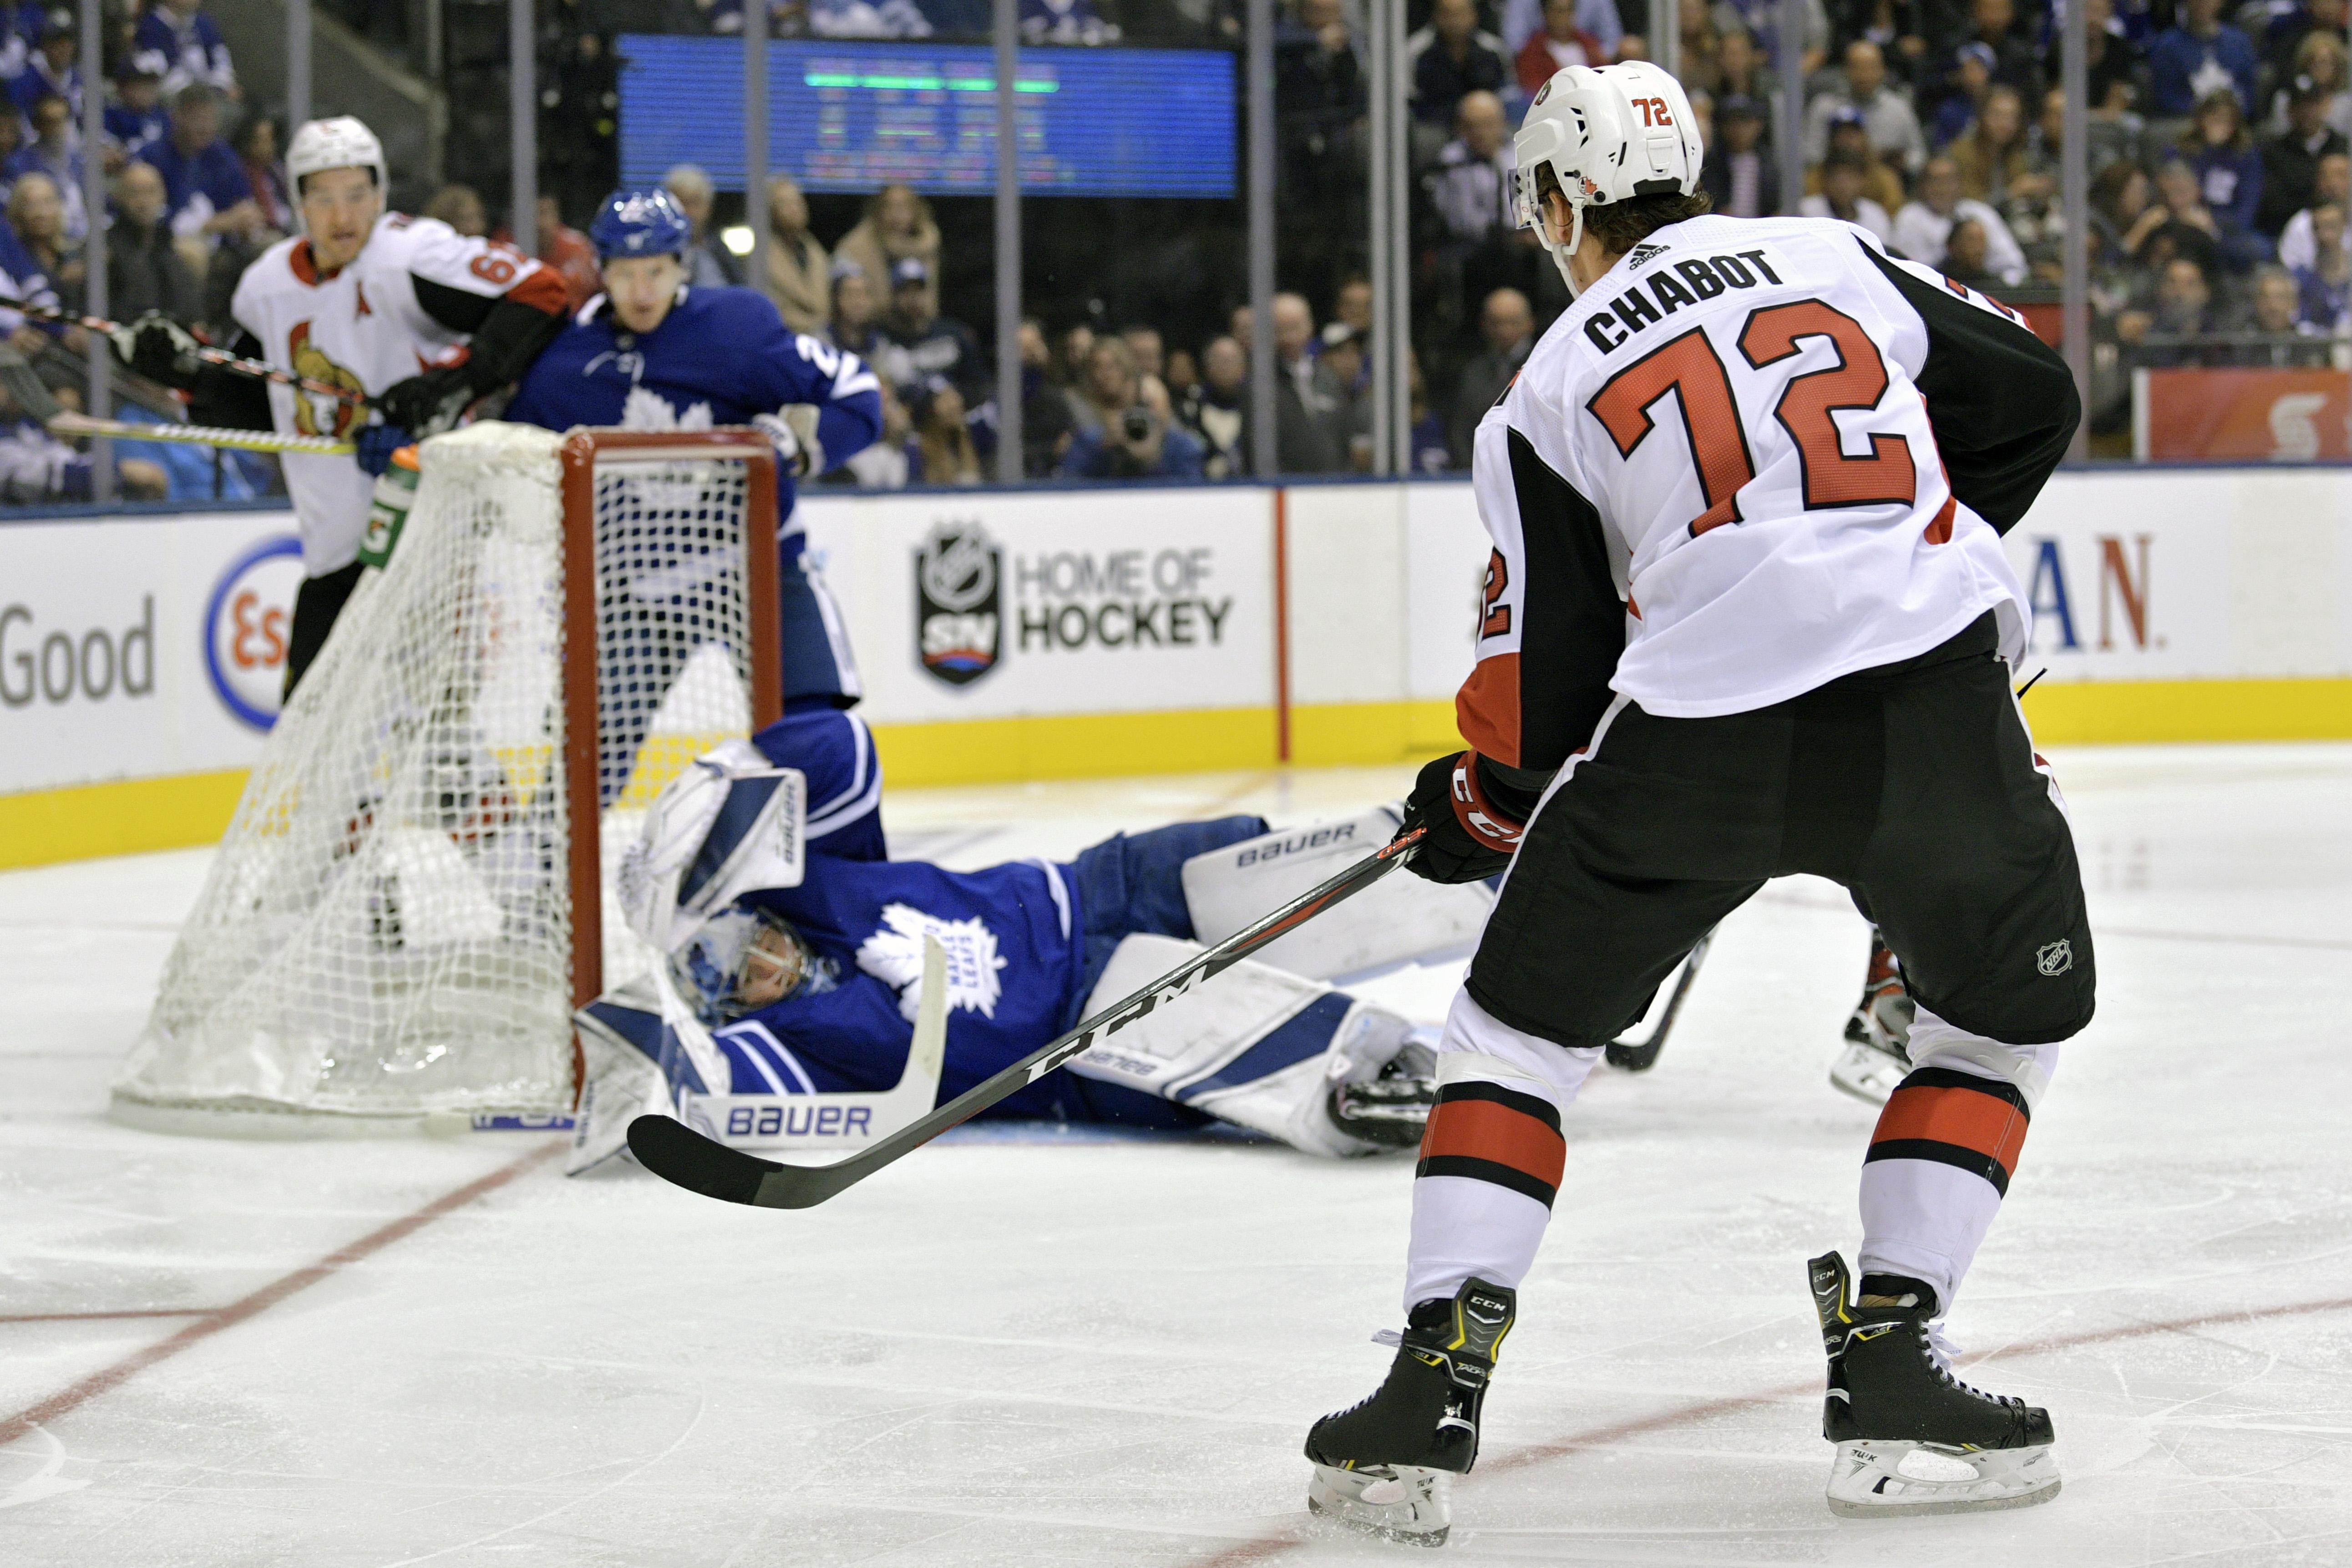 NHL: OCT 06 Senators at Maple Leafs